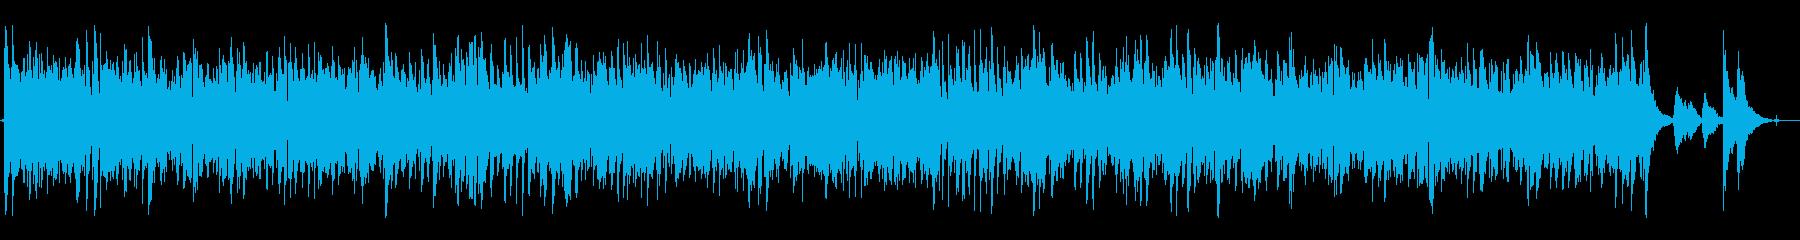 Bluesyアコースティックスライ...の再生済みの波形